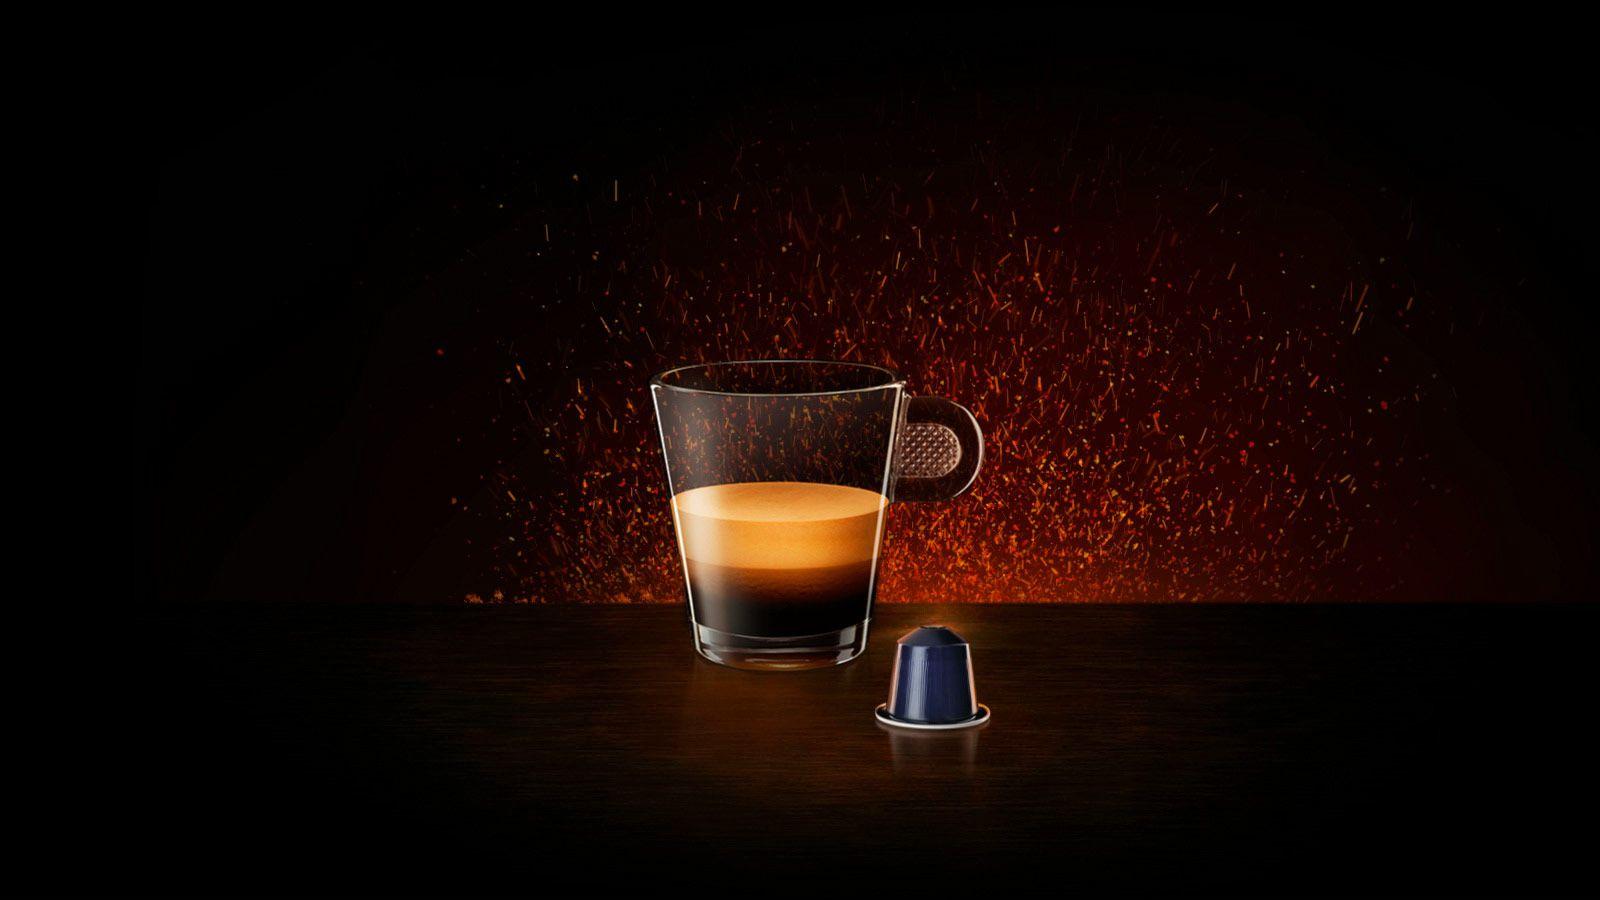 Kazaar Nespresso  tastes, treats and delights  Pinterest  -> Nespresso Kazaar